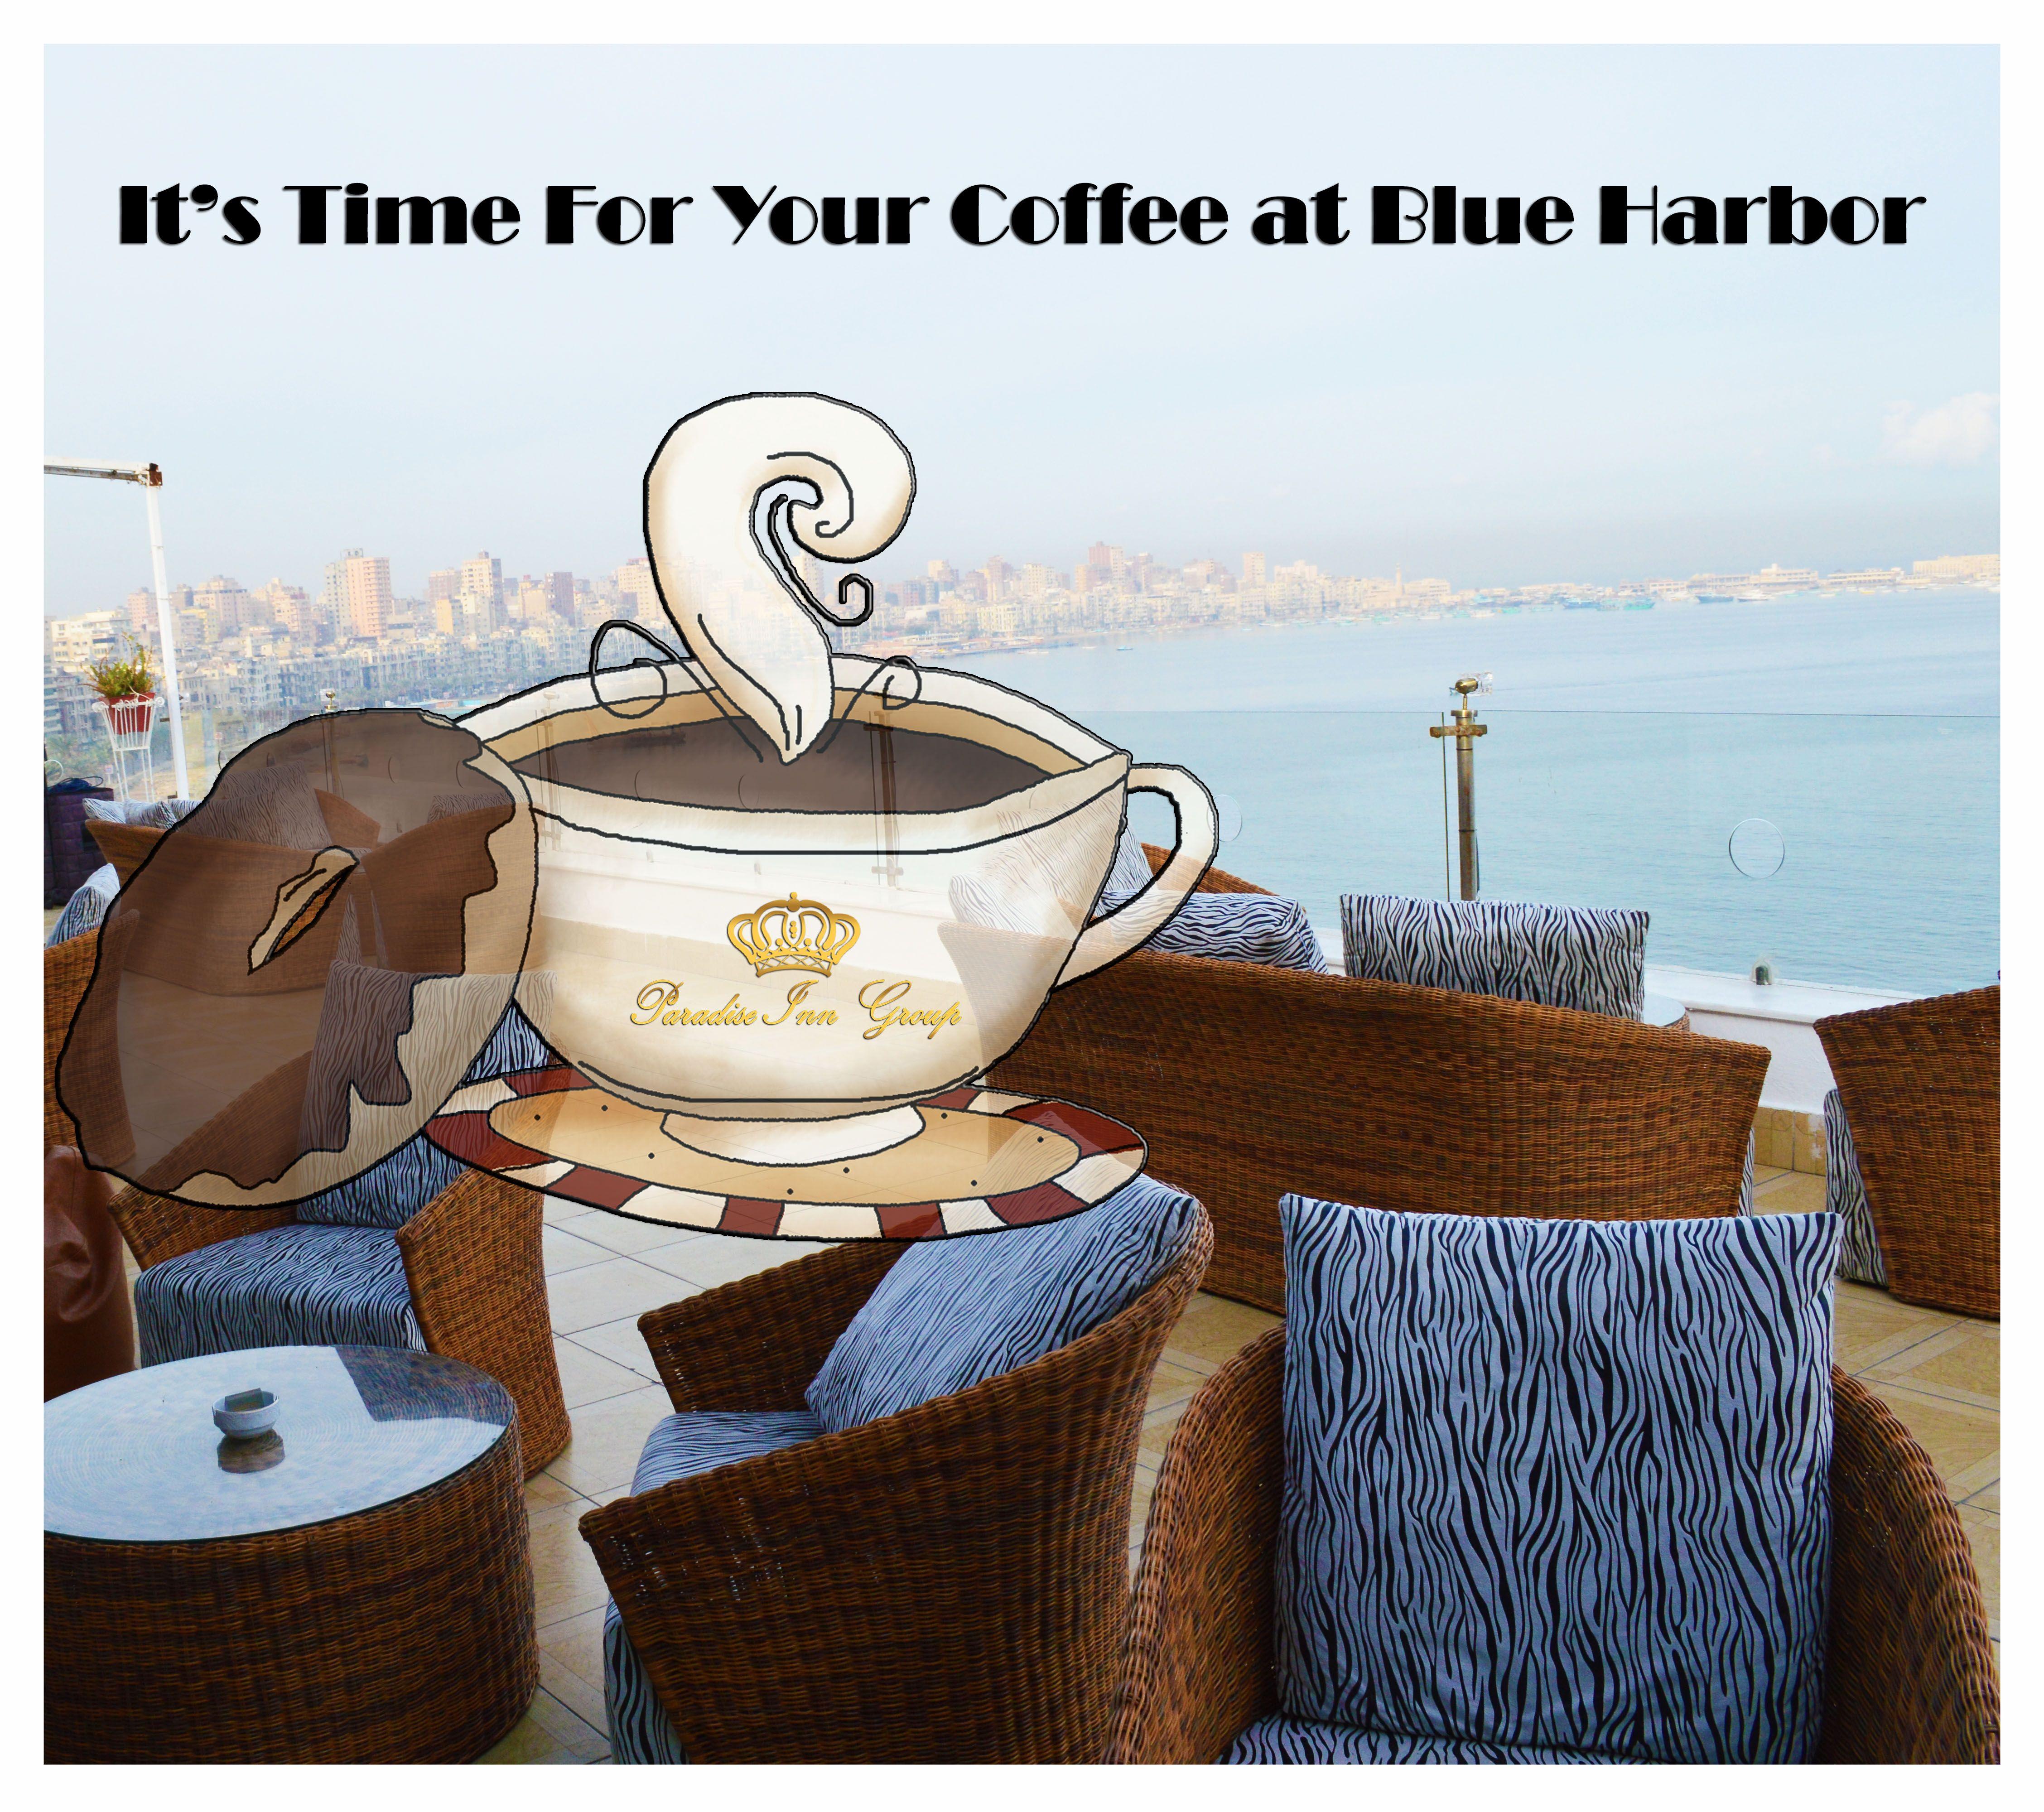 #good #morning #enjoy #coffee #time #blue #harbor #paradise